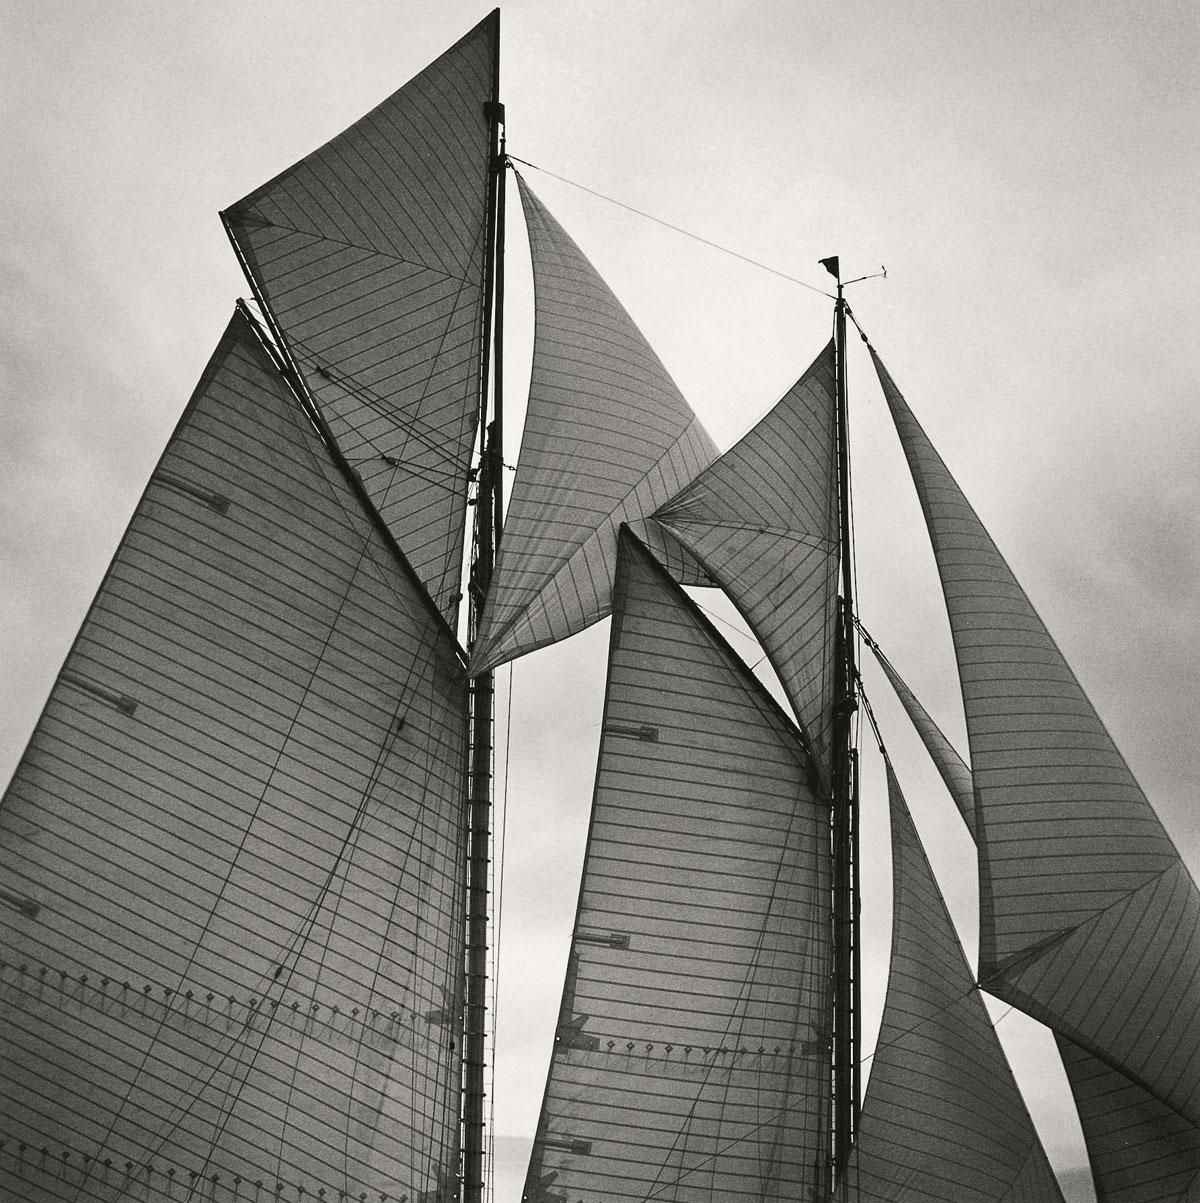 'Sails of Mariette', 1998. Michael Kahn